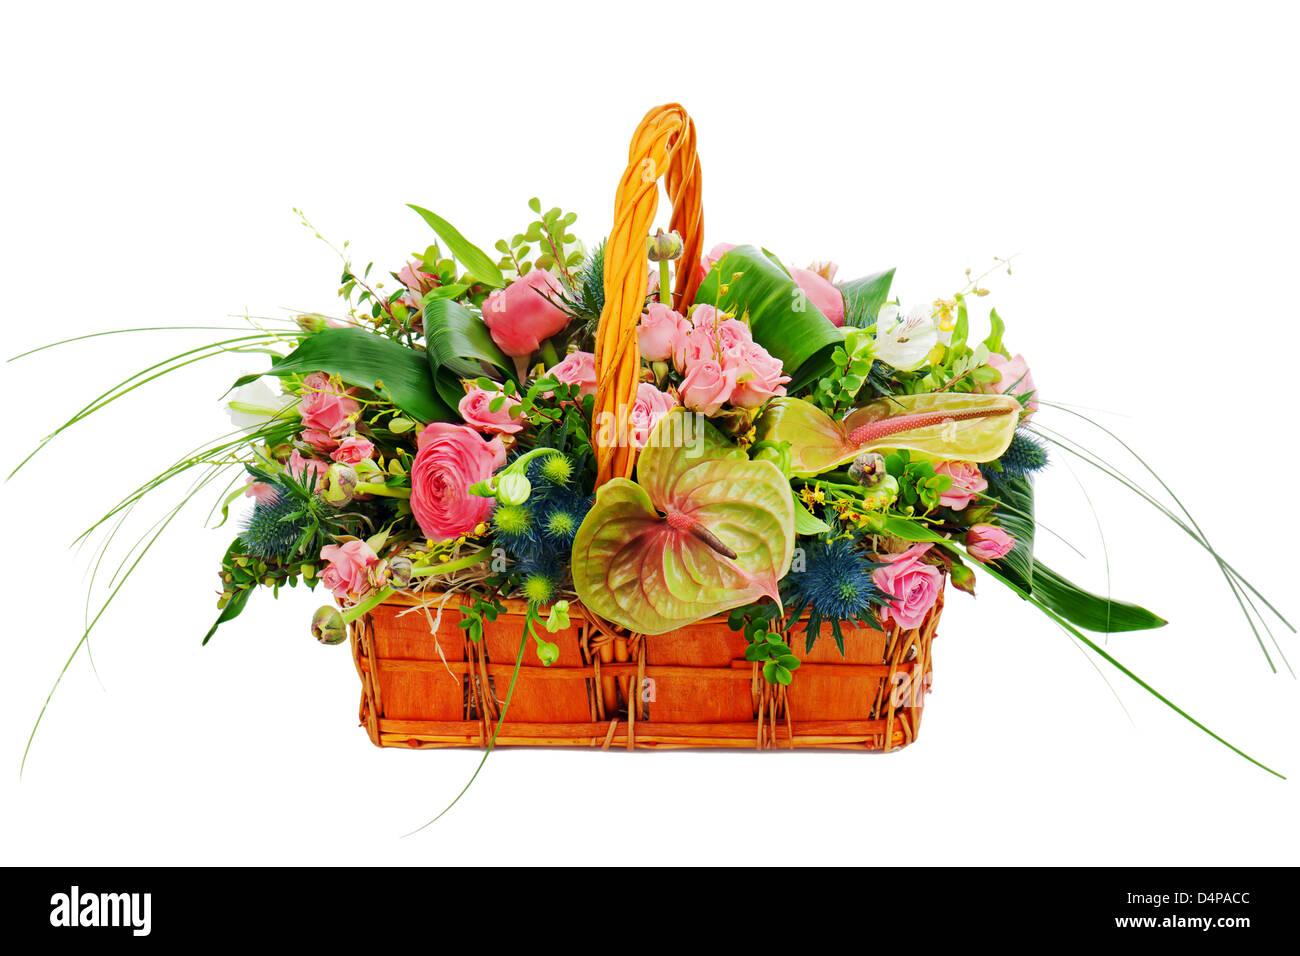 Flower Bouquet Arrangement Centerpiece In A Wicker Gift Basket Stock Photo Alamy